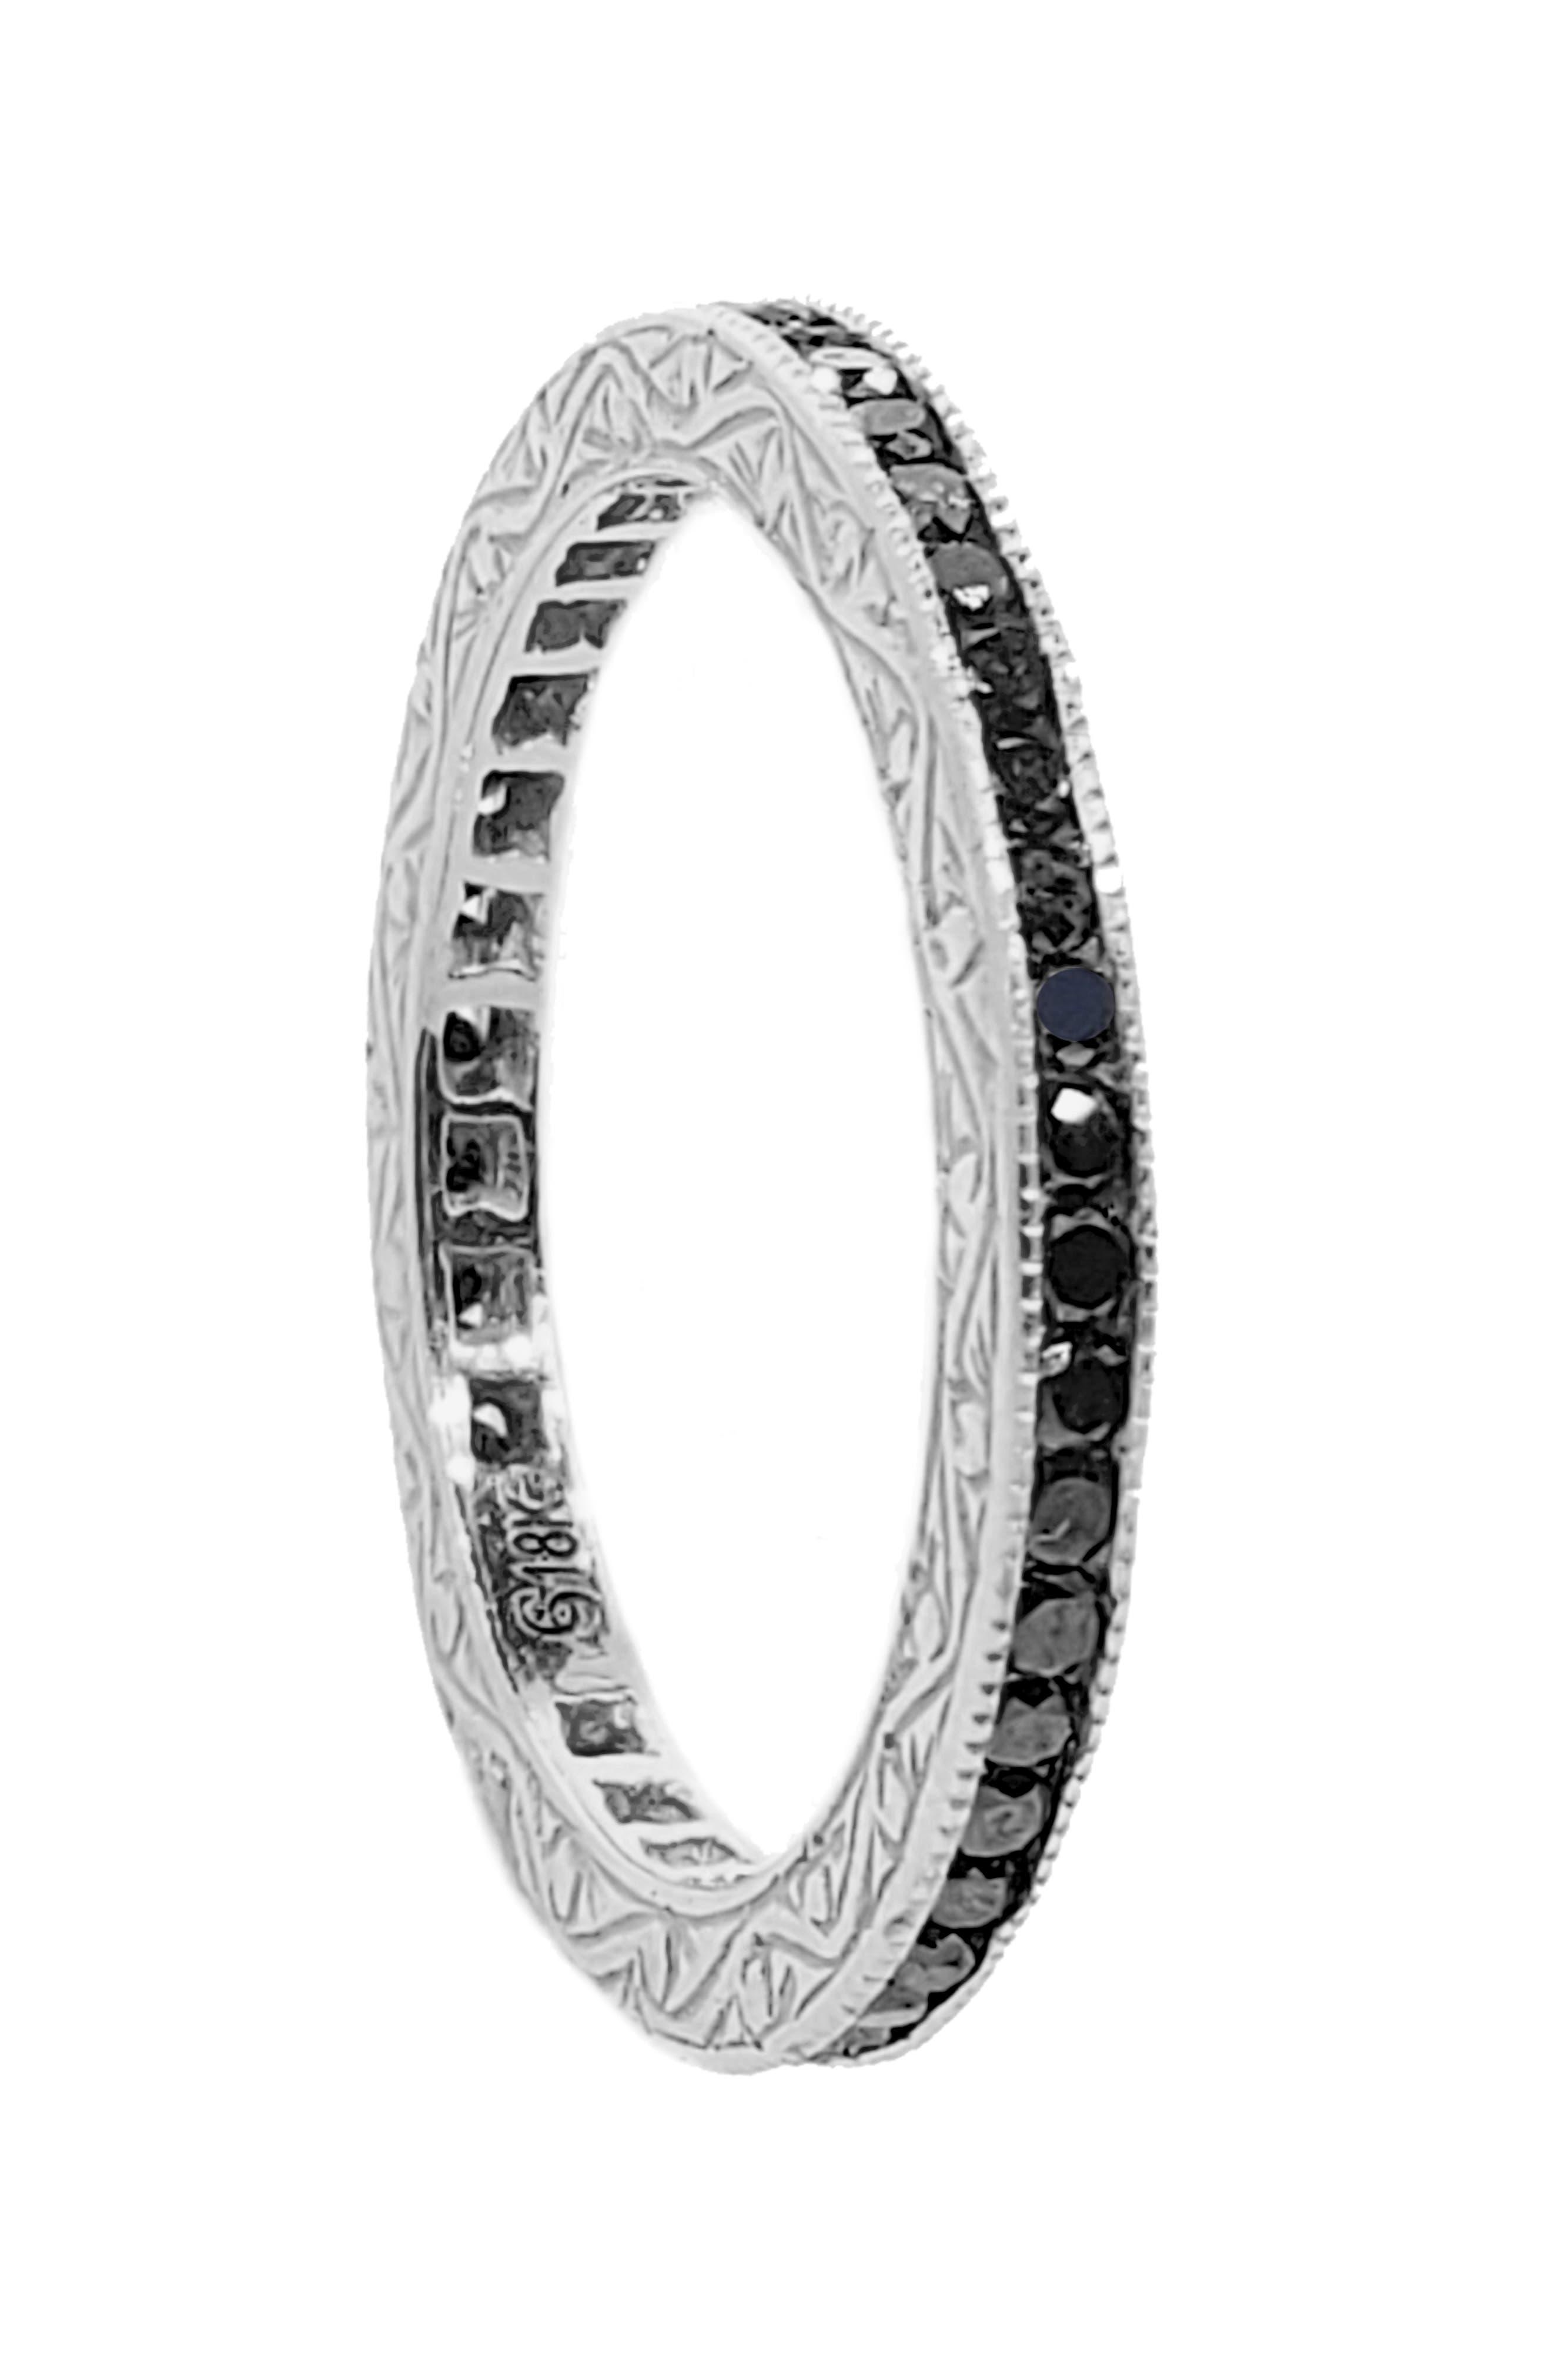 Channel Set Diamond Ring,                             Main thumbnail 1, color,                             White Gold/ Black Diamond